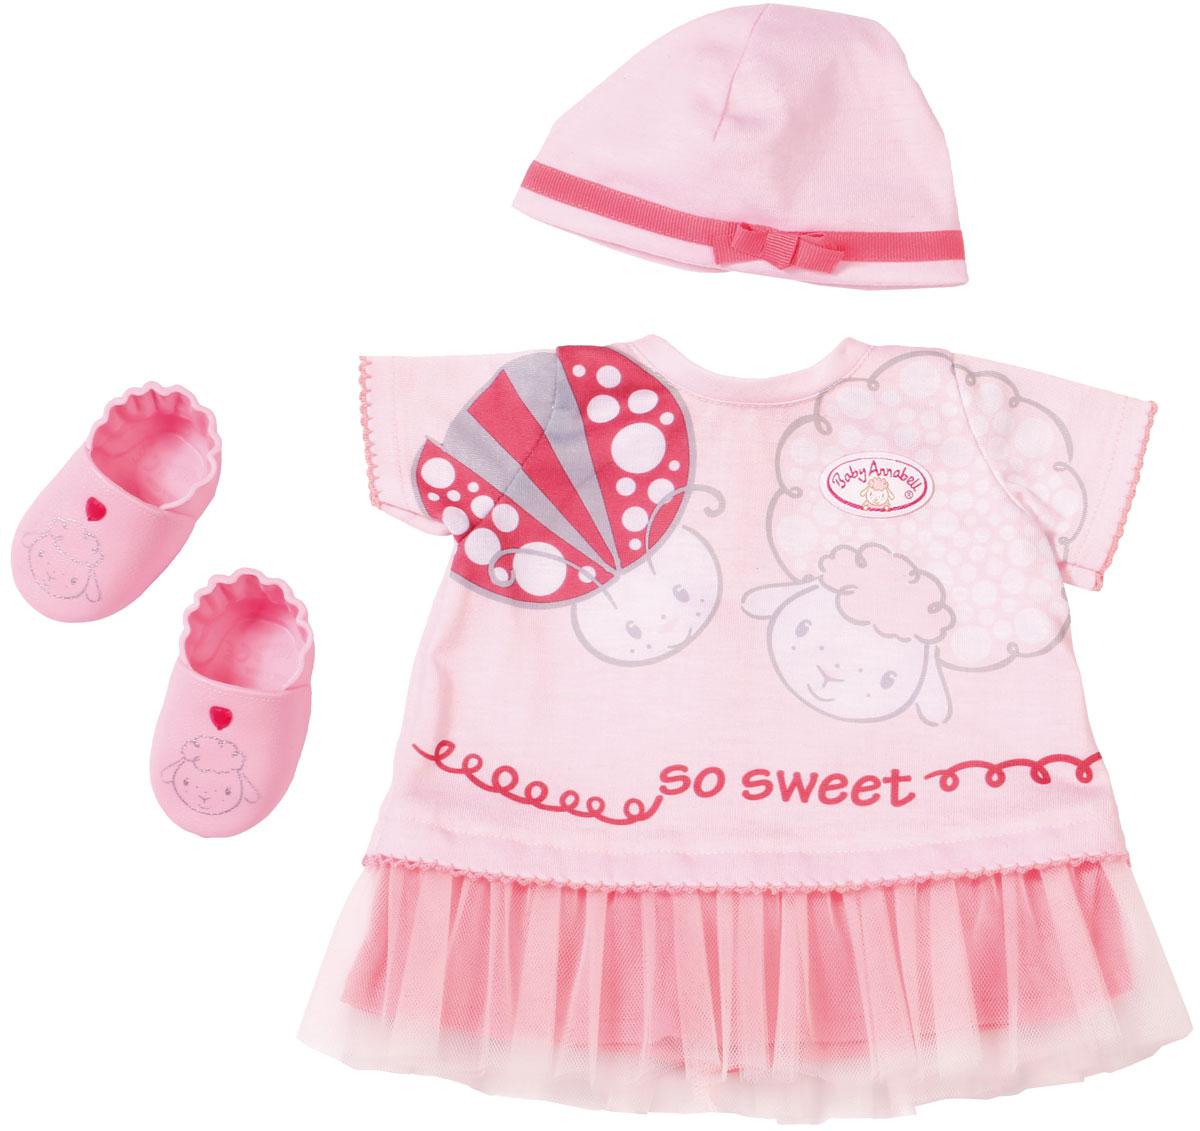 Zapf Одежда для куклы Baby Annabell Платье шапочка пинетки аксессуары для кукол zapf игрушка baby annabell памперсы